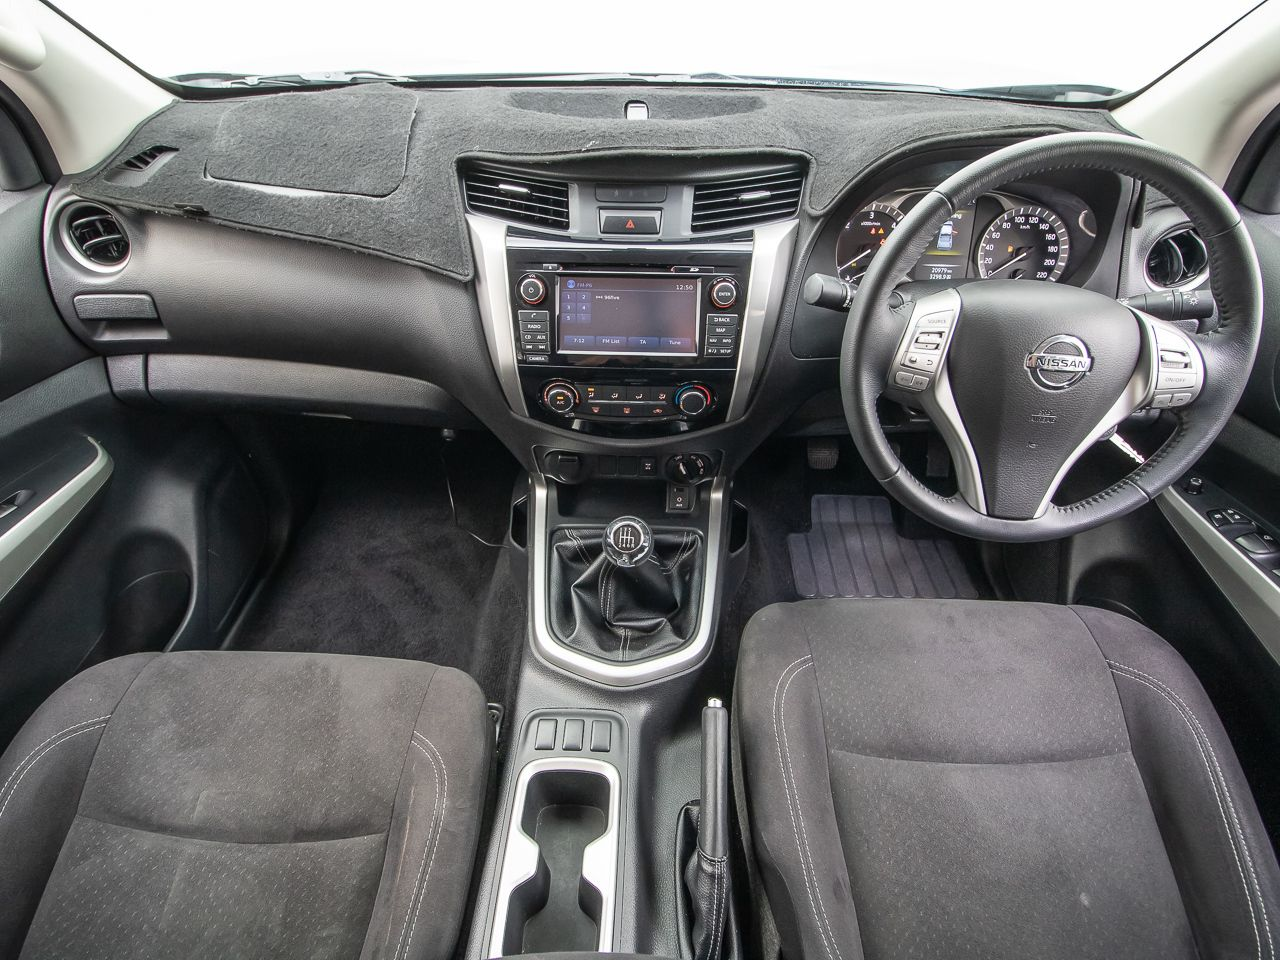 2019 Nissan Navara JandakotWA, Jandakot, WA en 2020